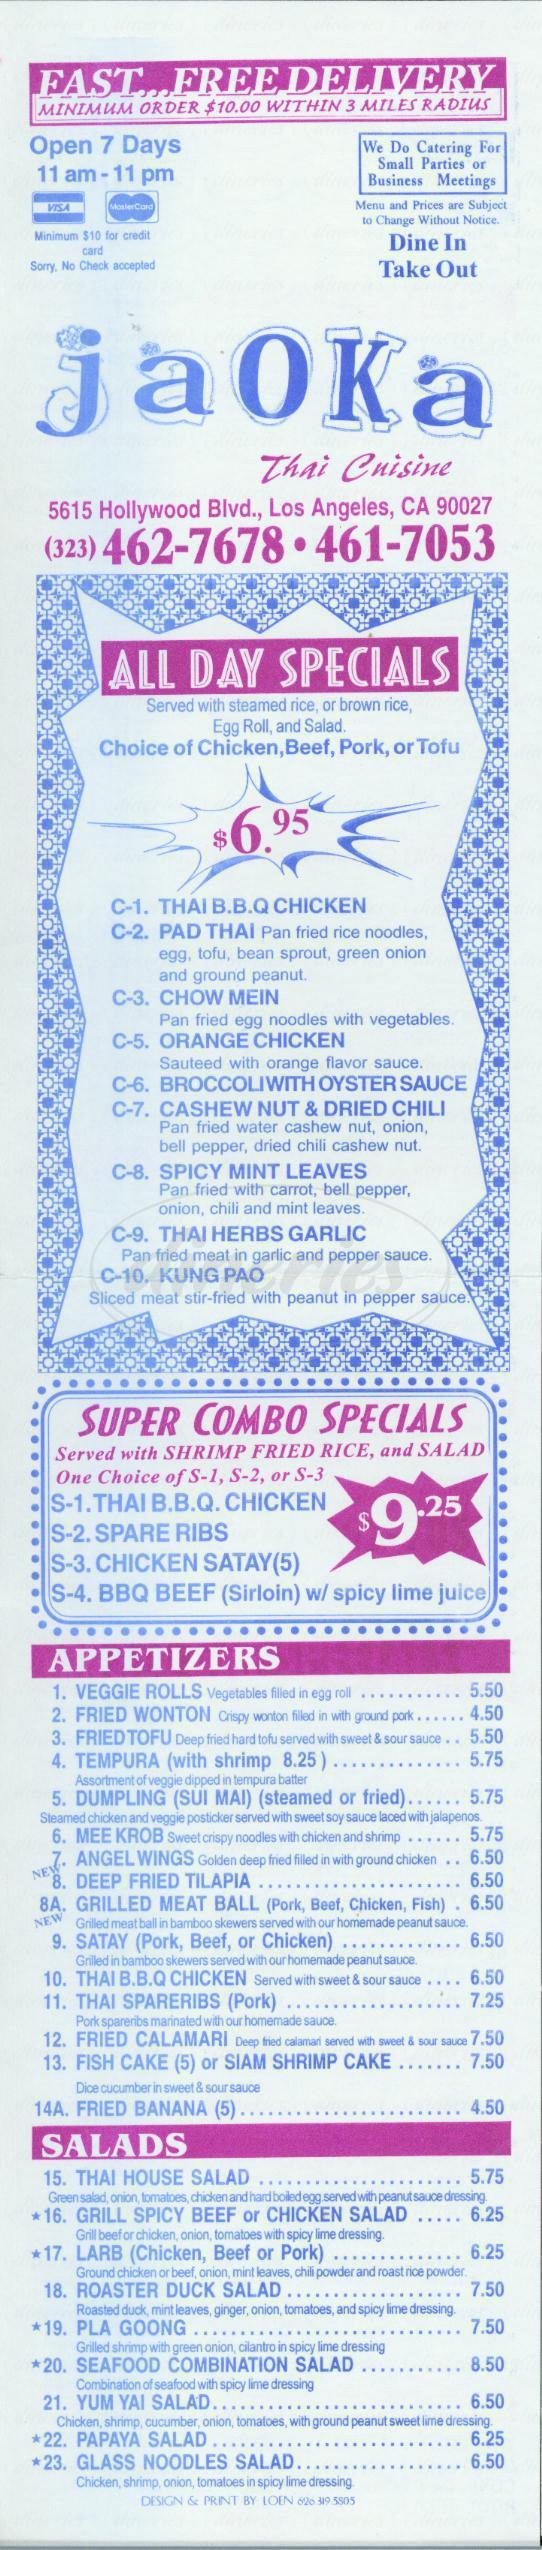 menu for Jaoka Thai Cuisine